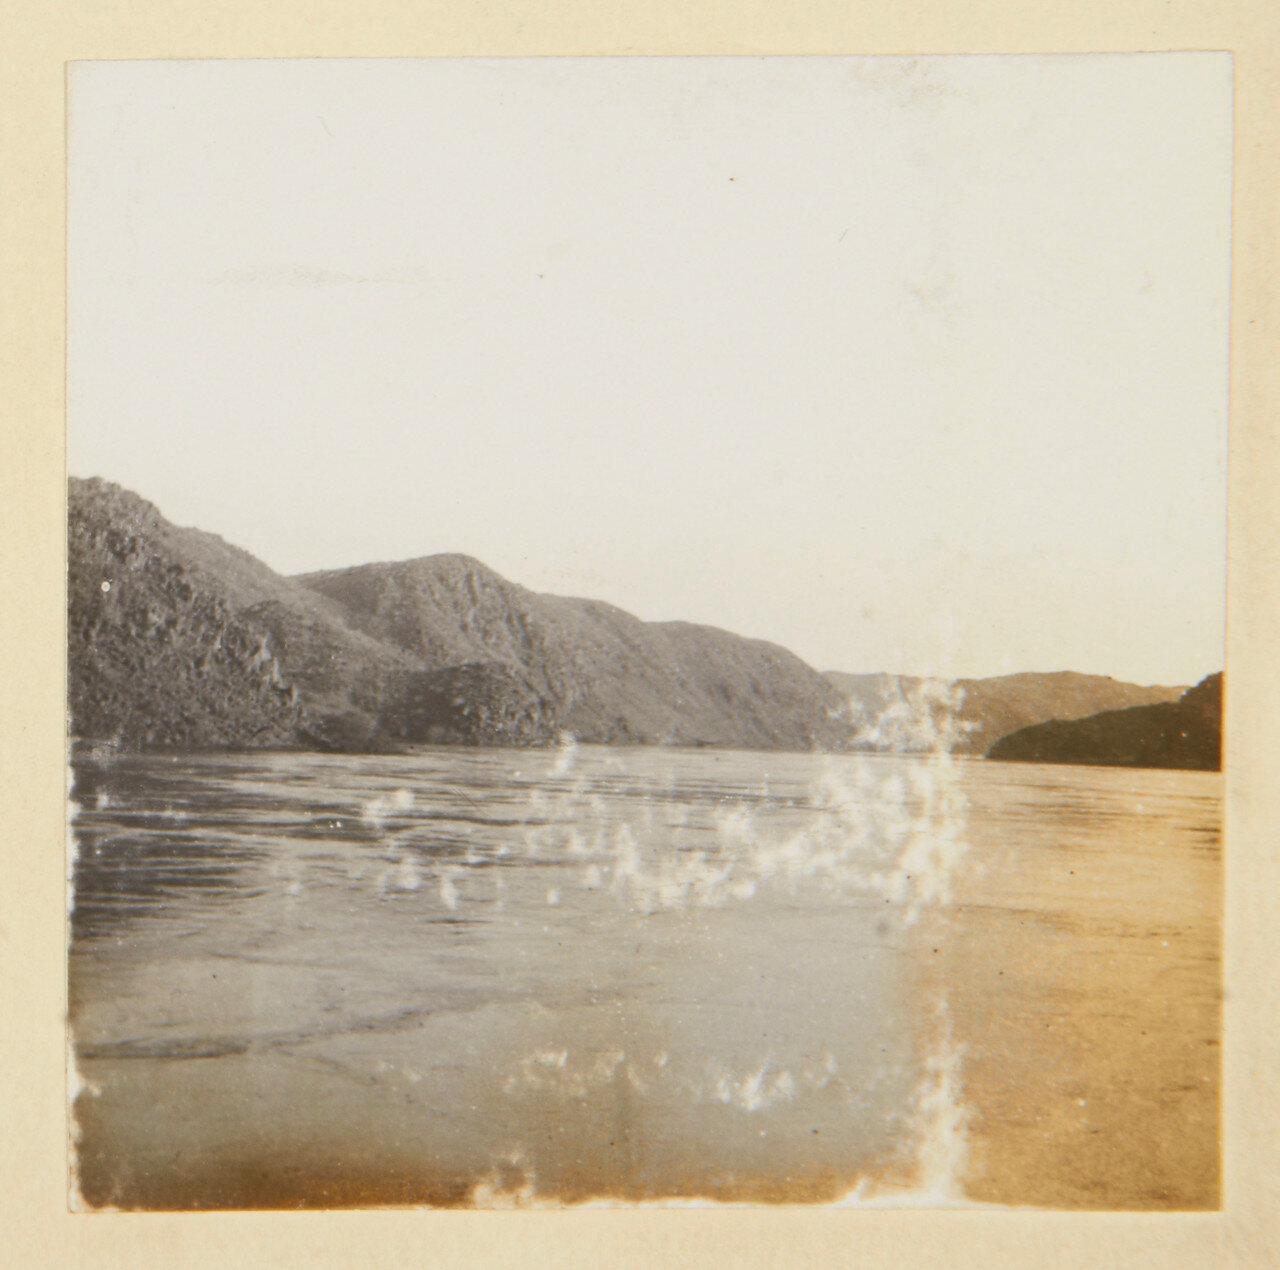 Август 1898. Речной порог Шаблука